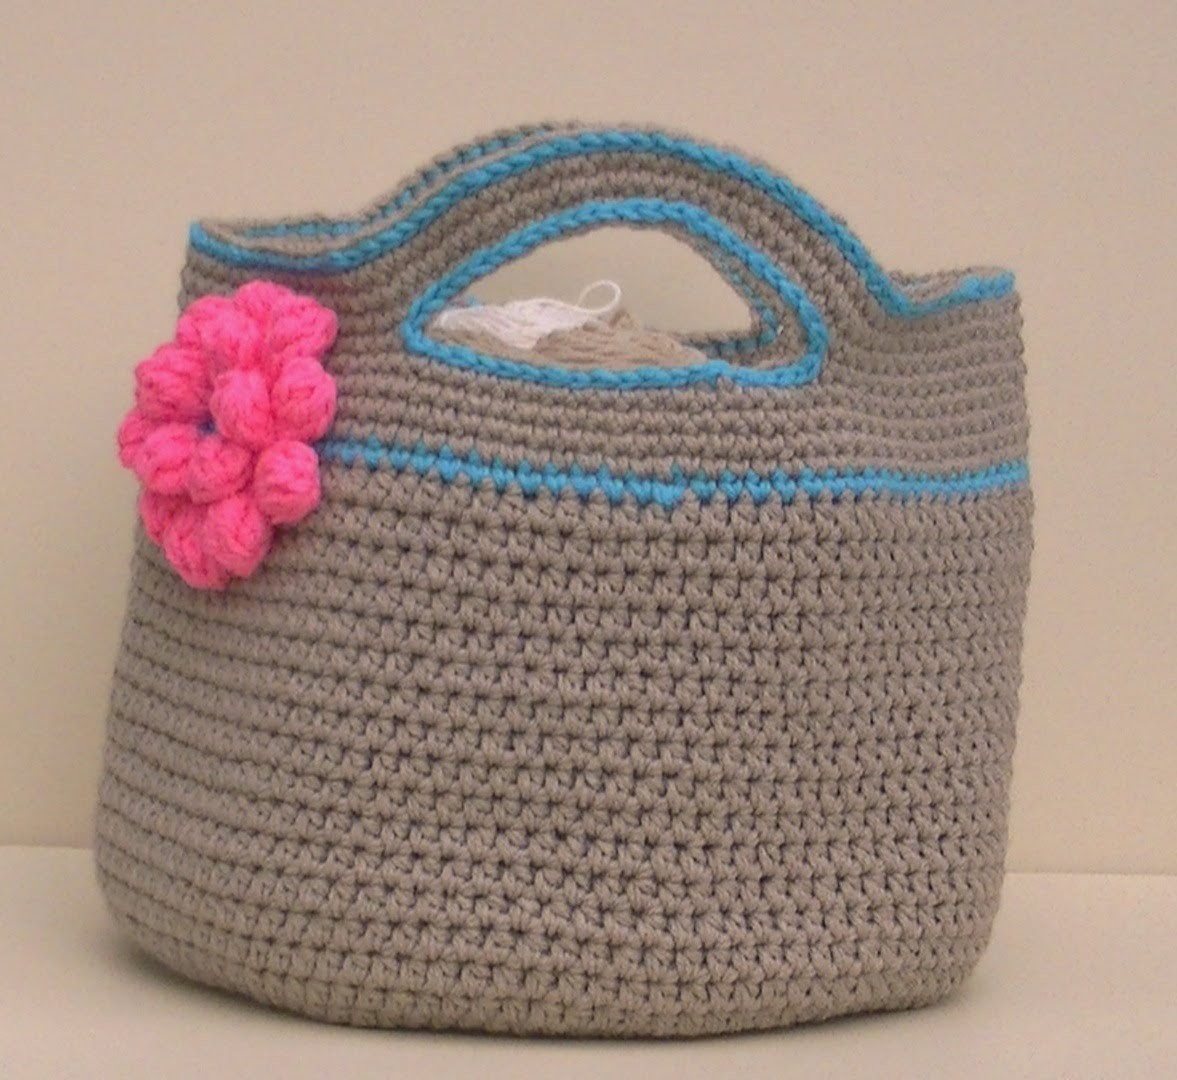 Crochet Basket Stash - Buster Part 1 of 2